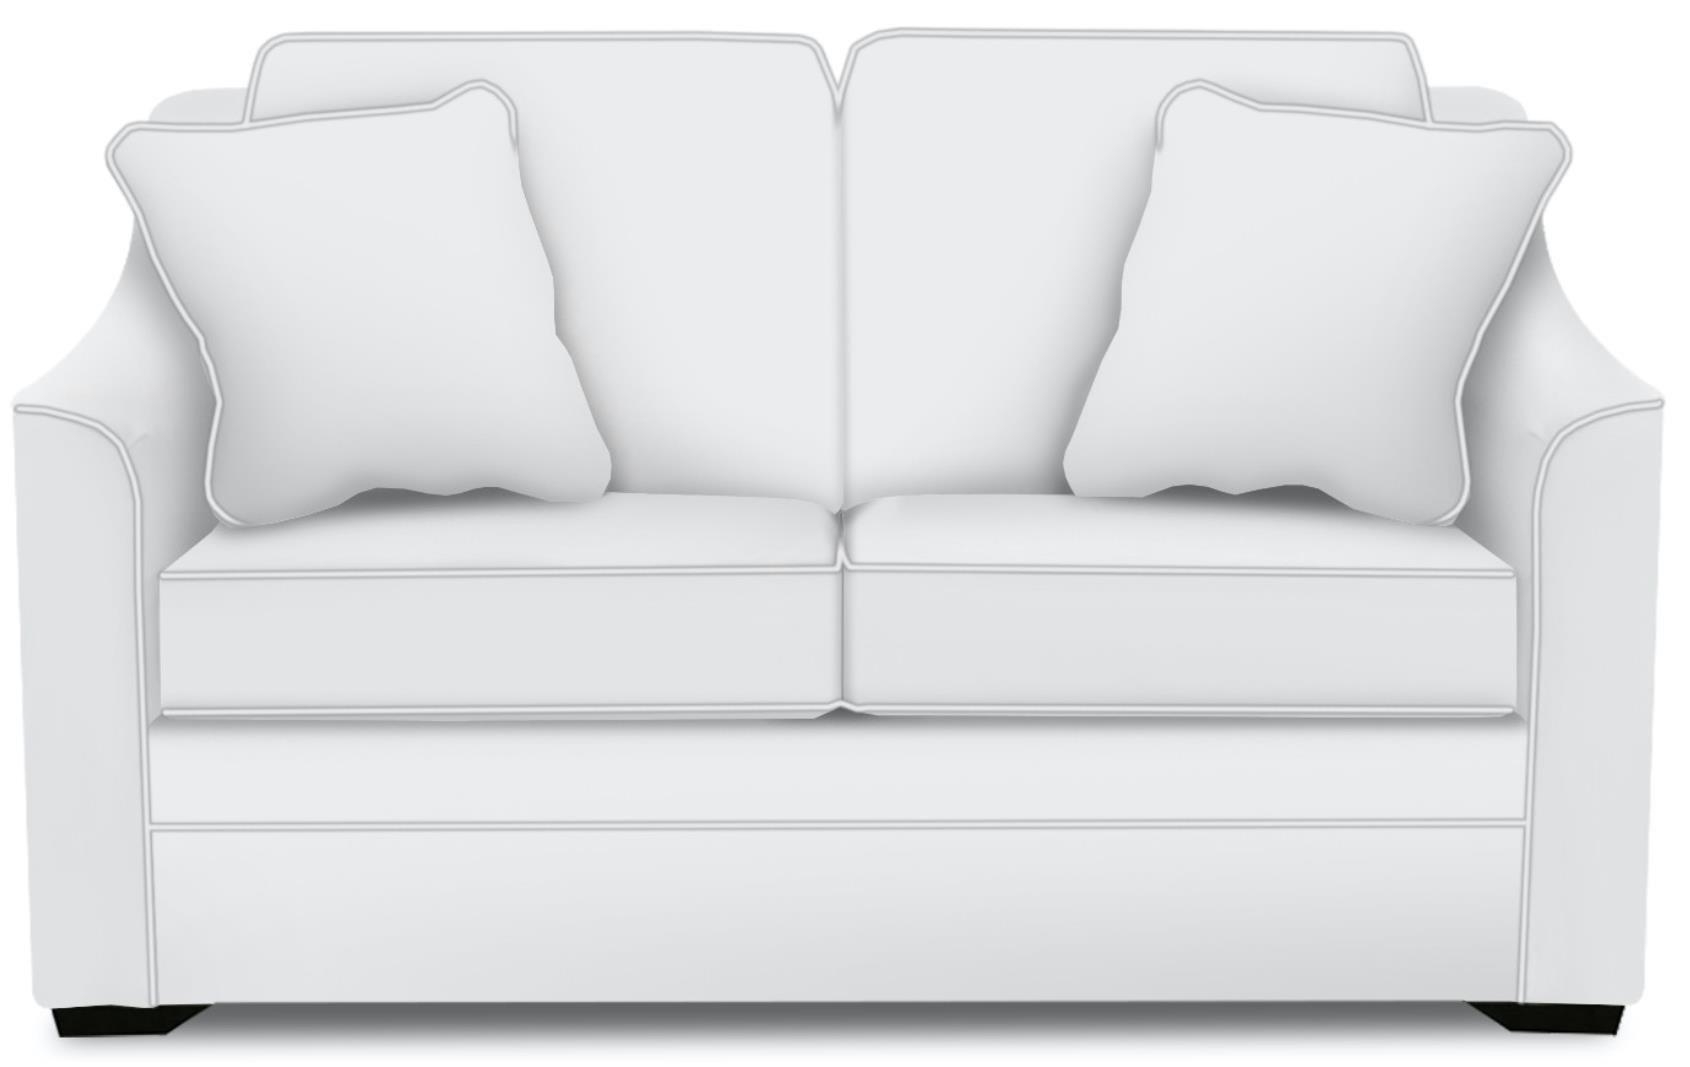 England Thomas Twin Sleeper Reeds Furniture Sleeper Sofas